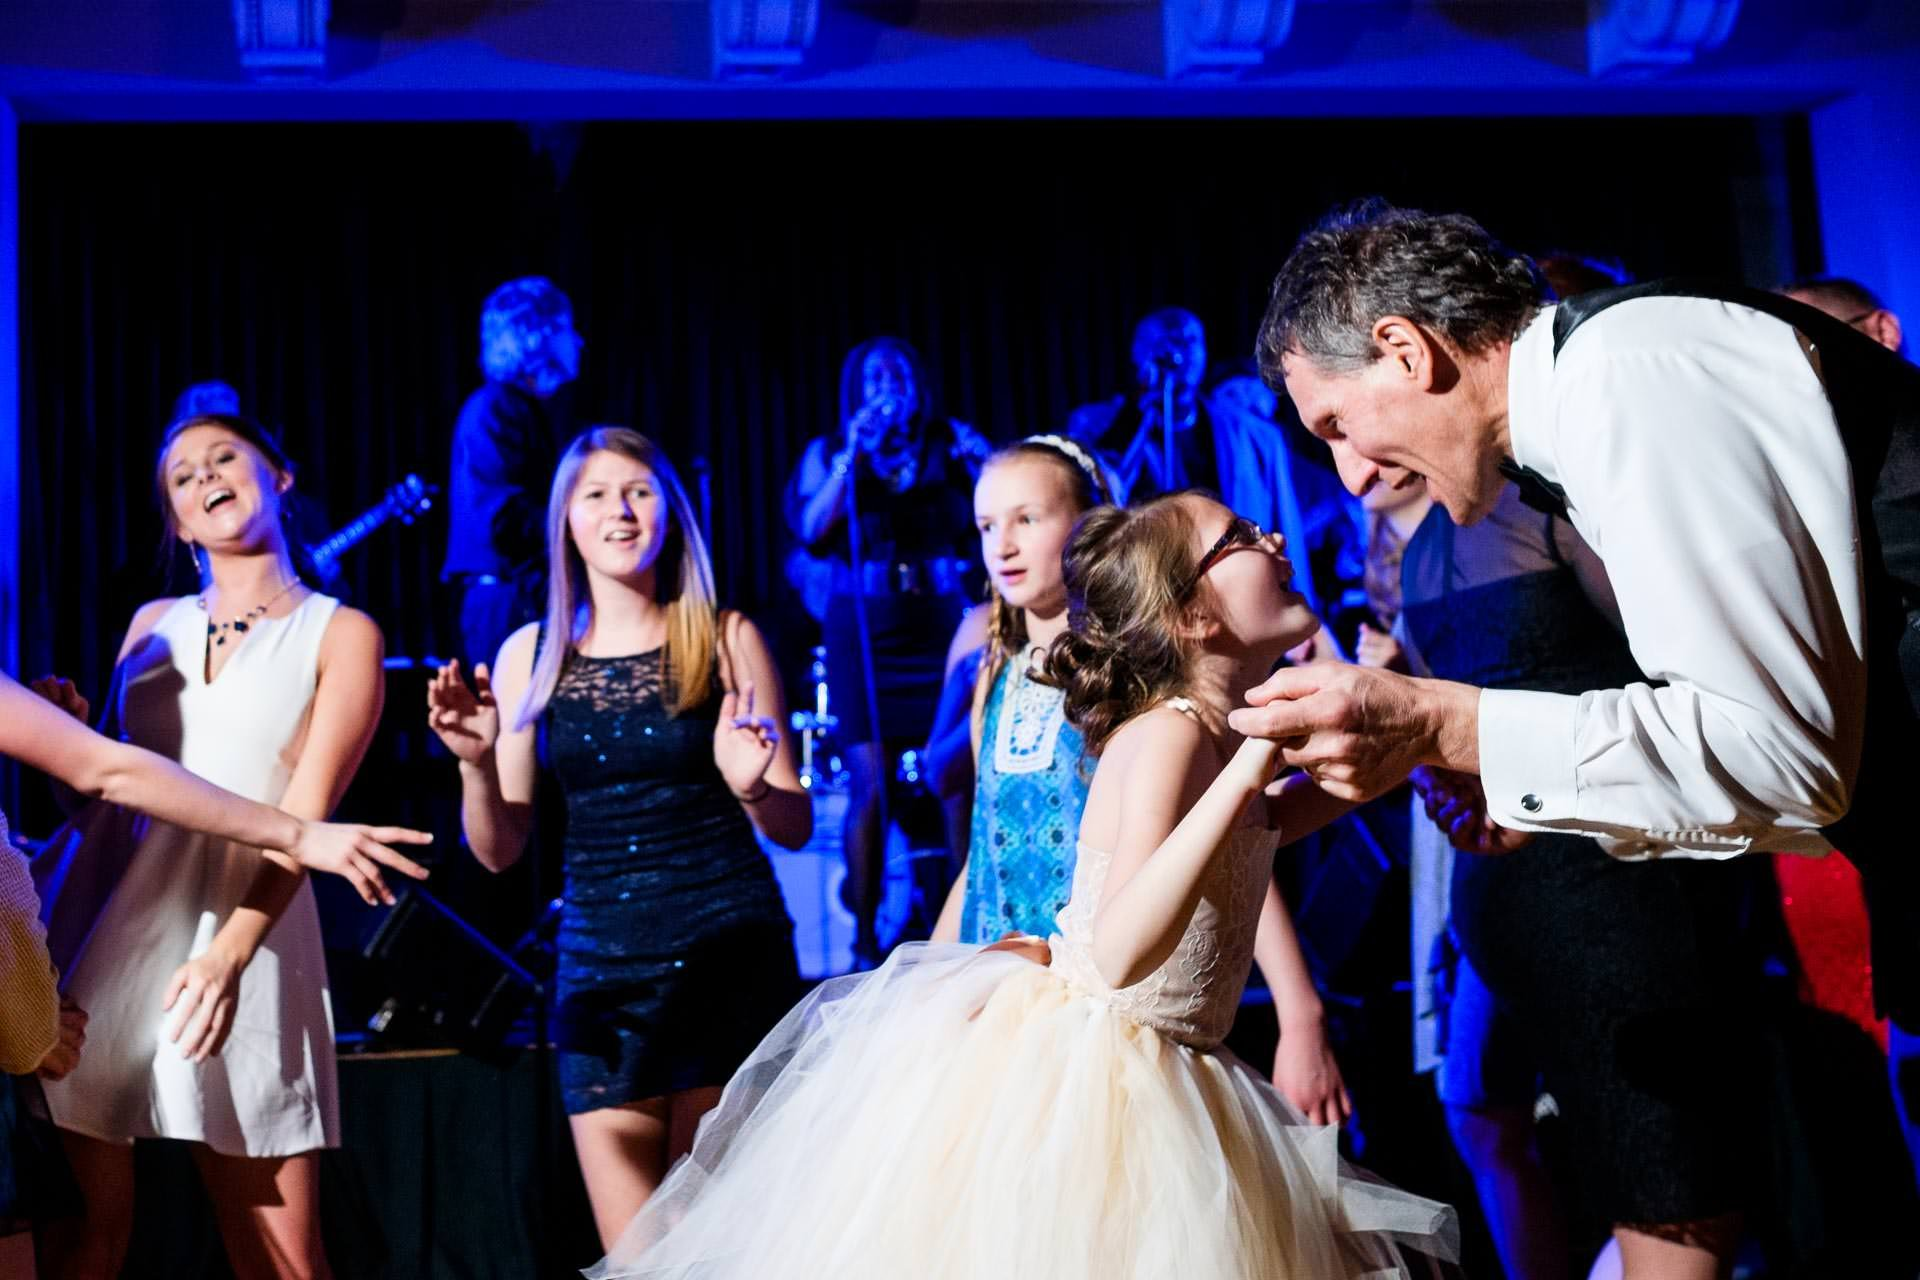 0072_KJFSaint-Paul-Athletic-Club-Wedding-Reception